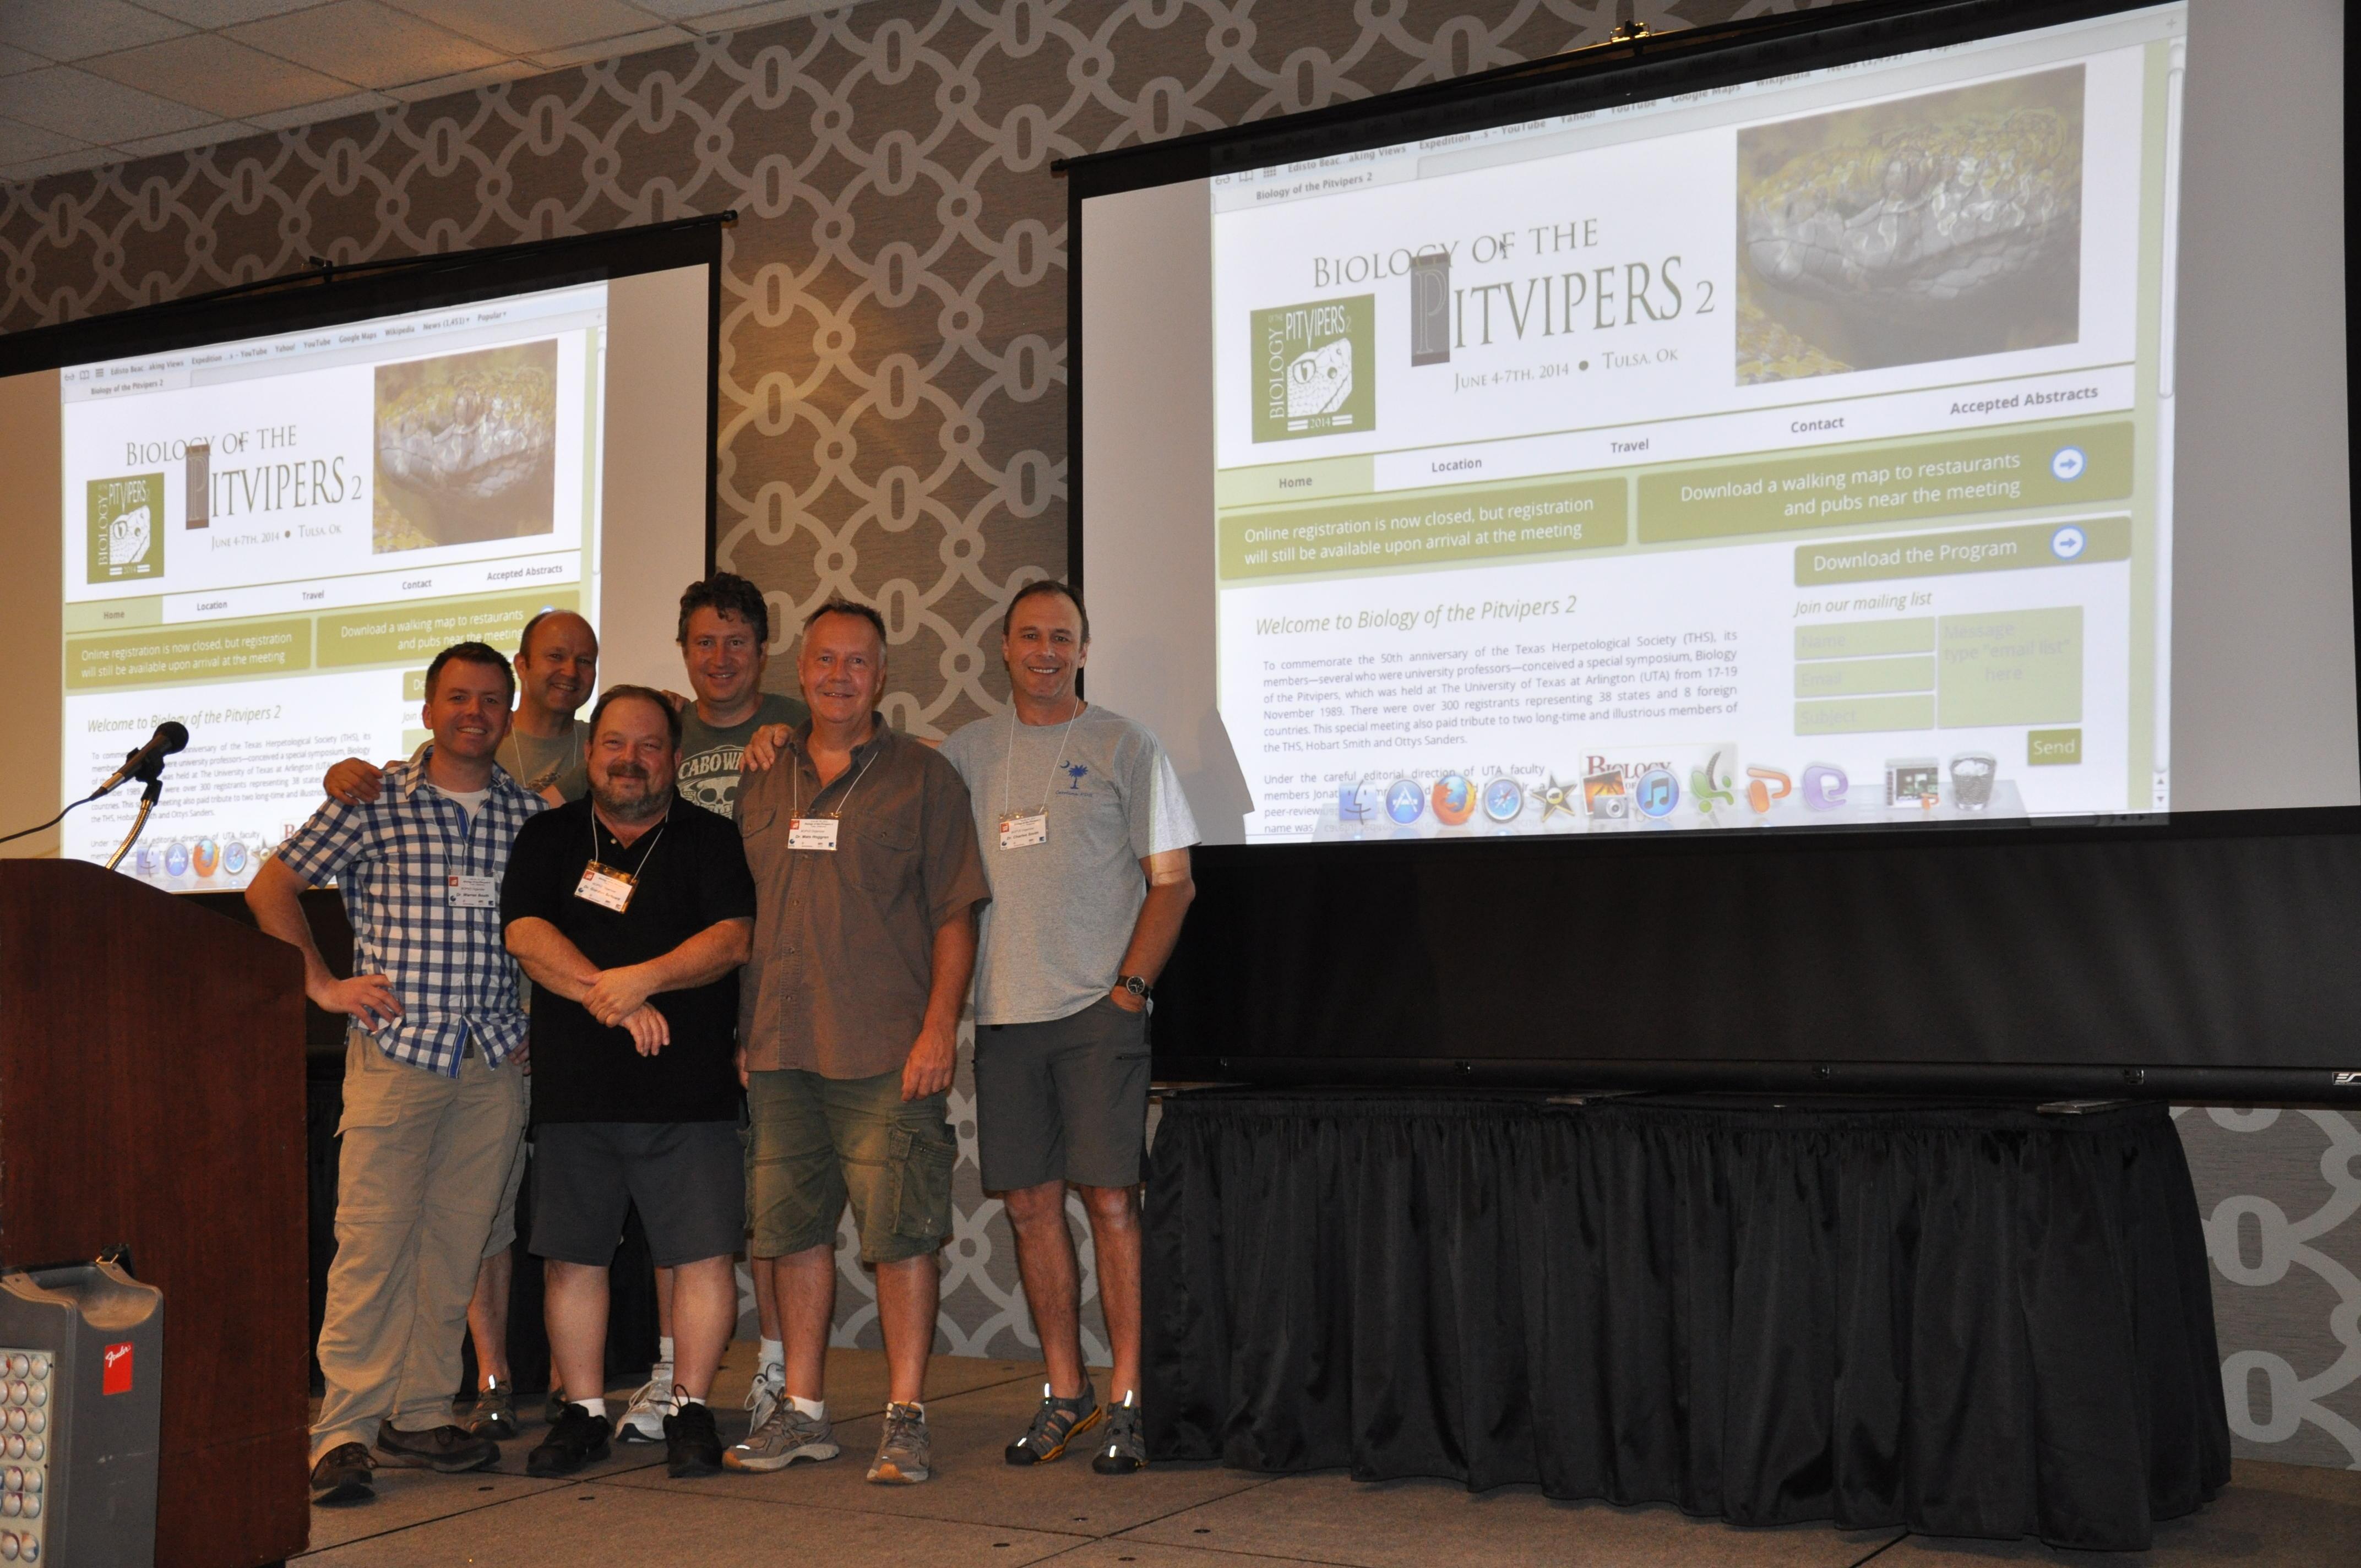 BOPV2 Organizers